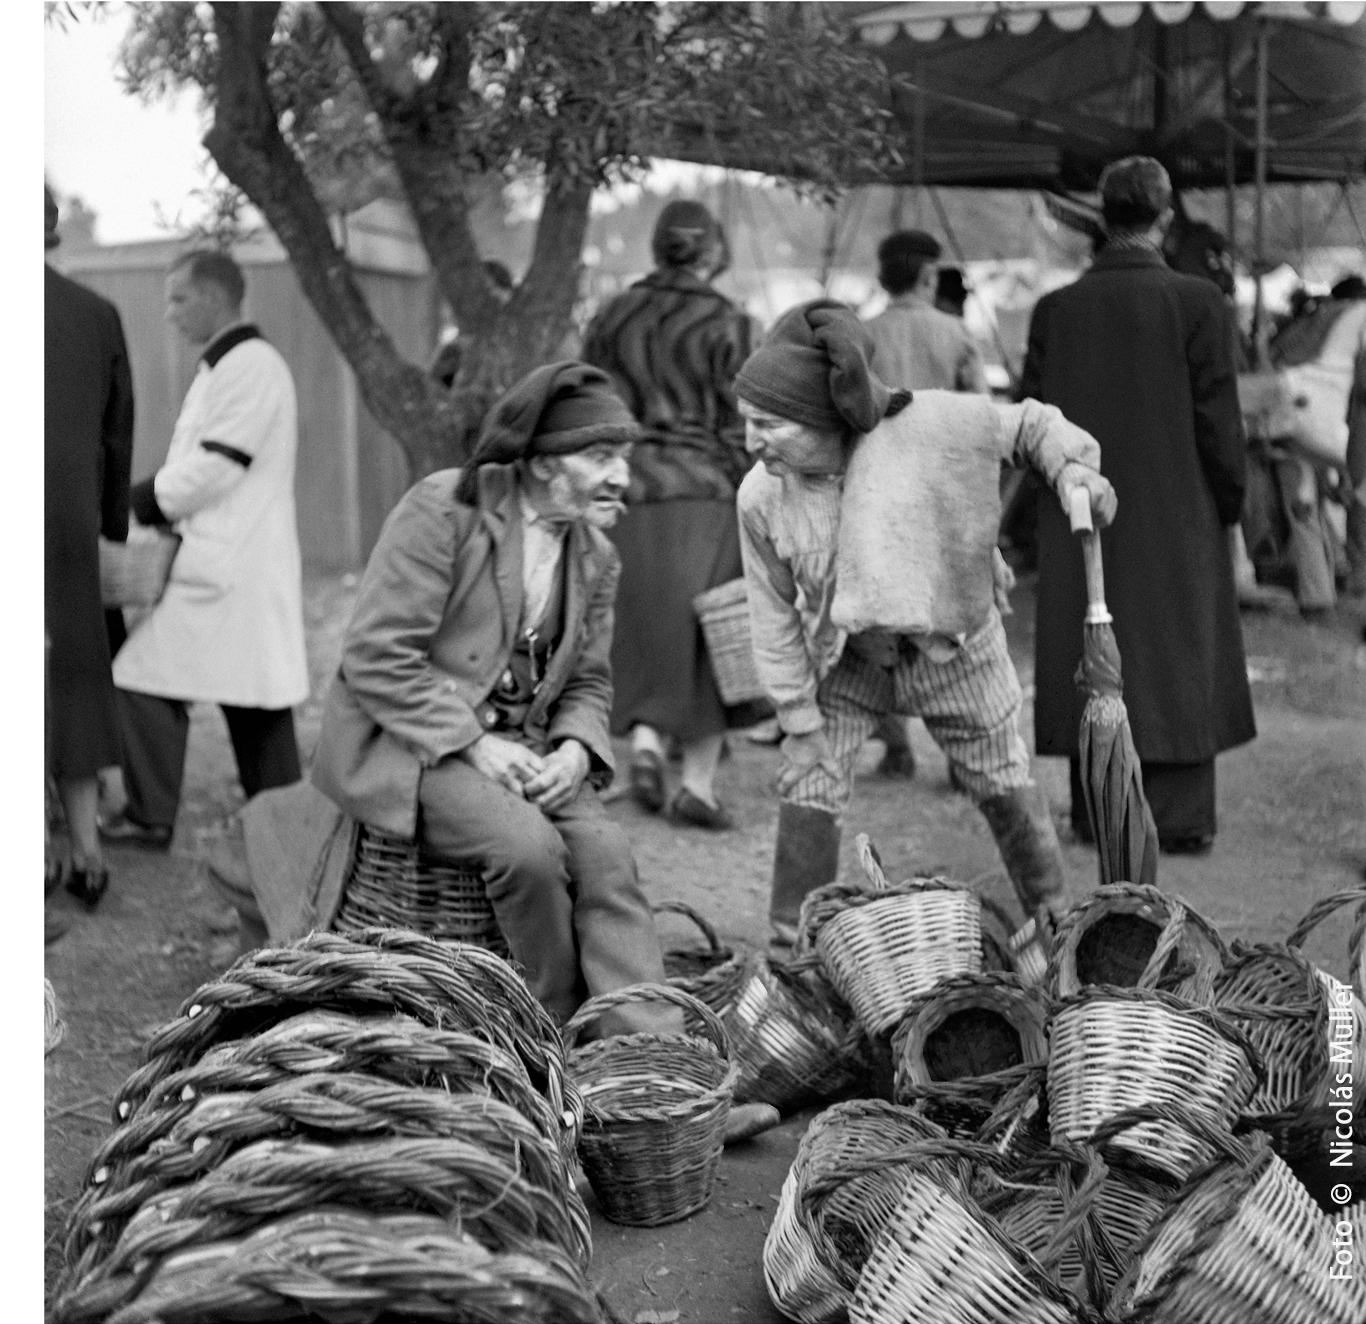 Mercado de Vilar Formoso IV  1939